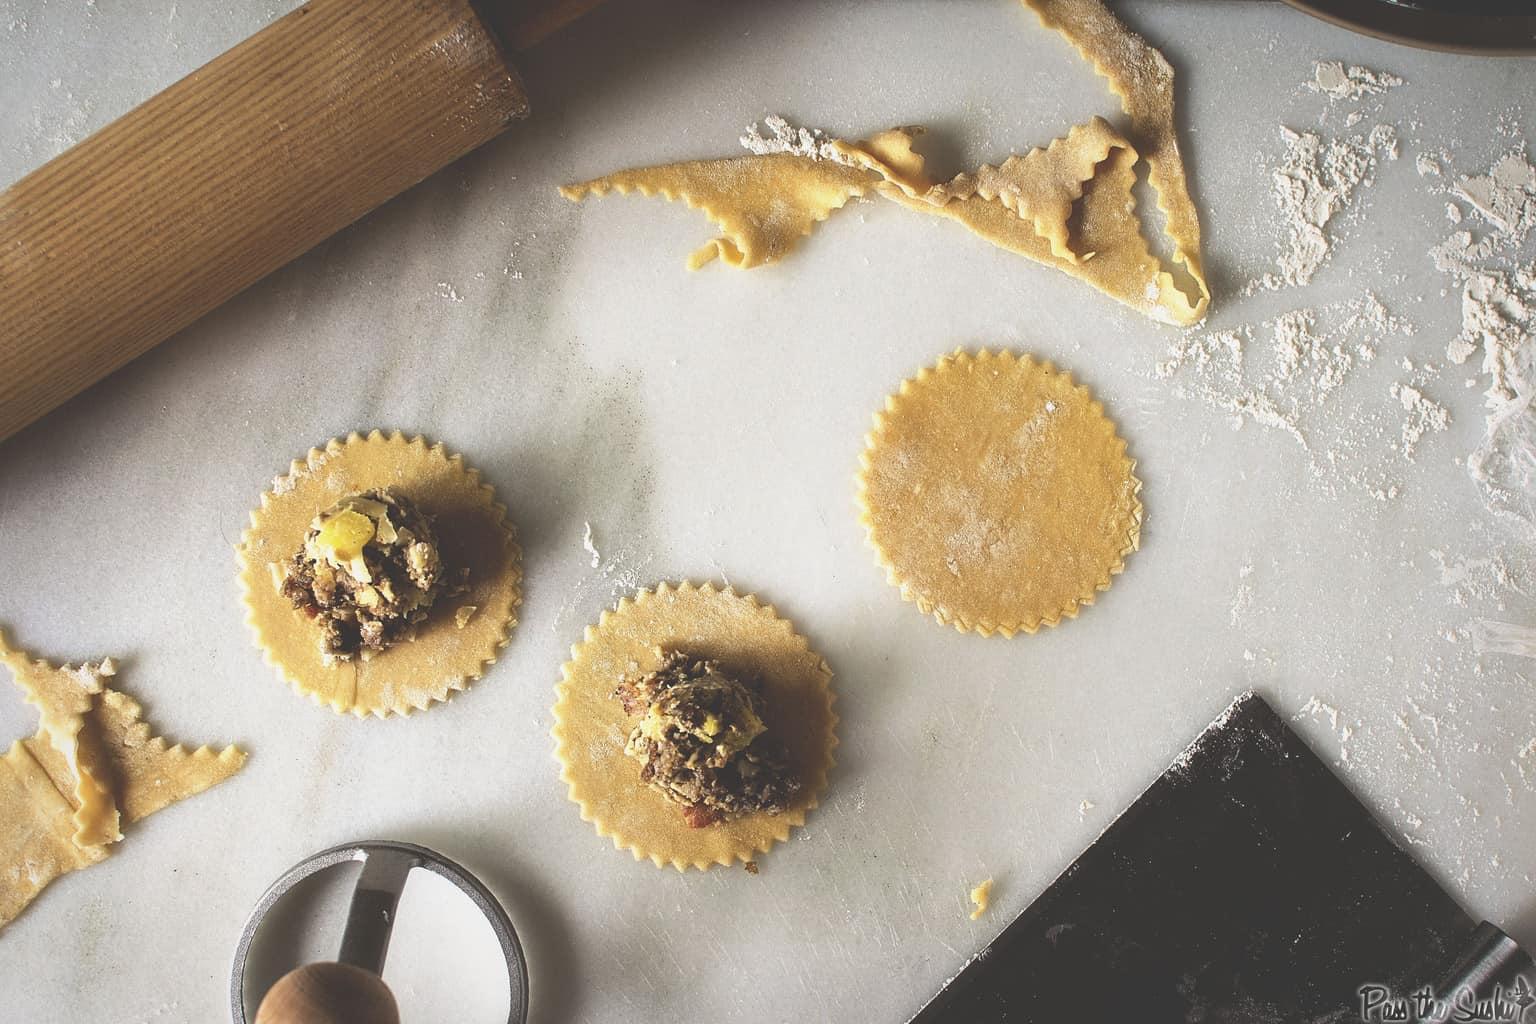 How to make Homemade Pasta | Kita Roberts PassTheSushi.com